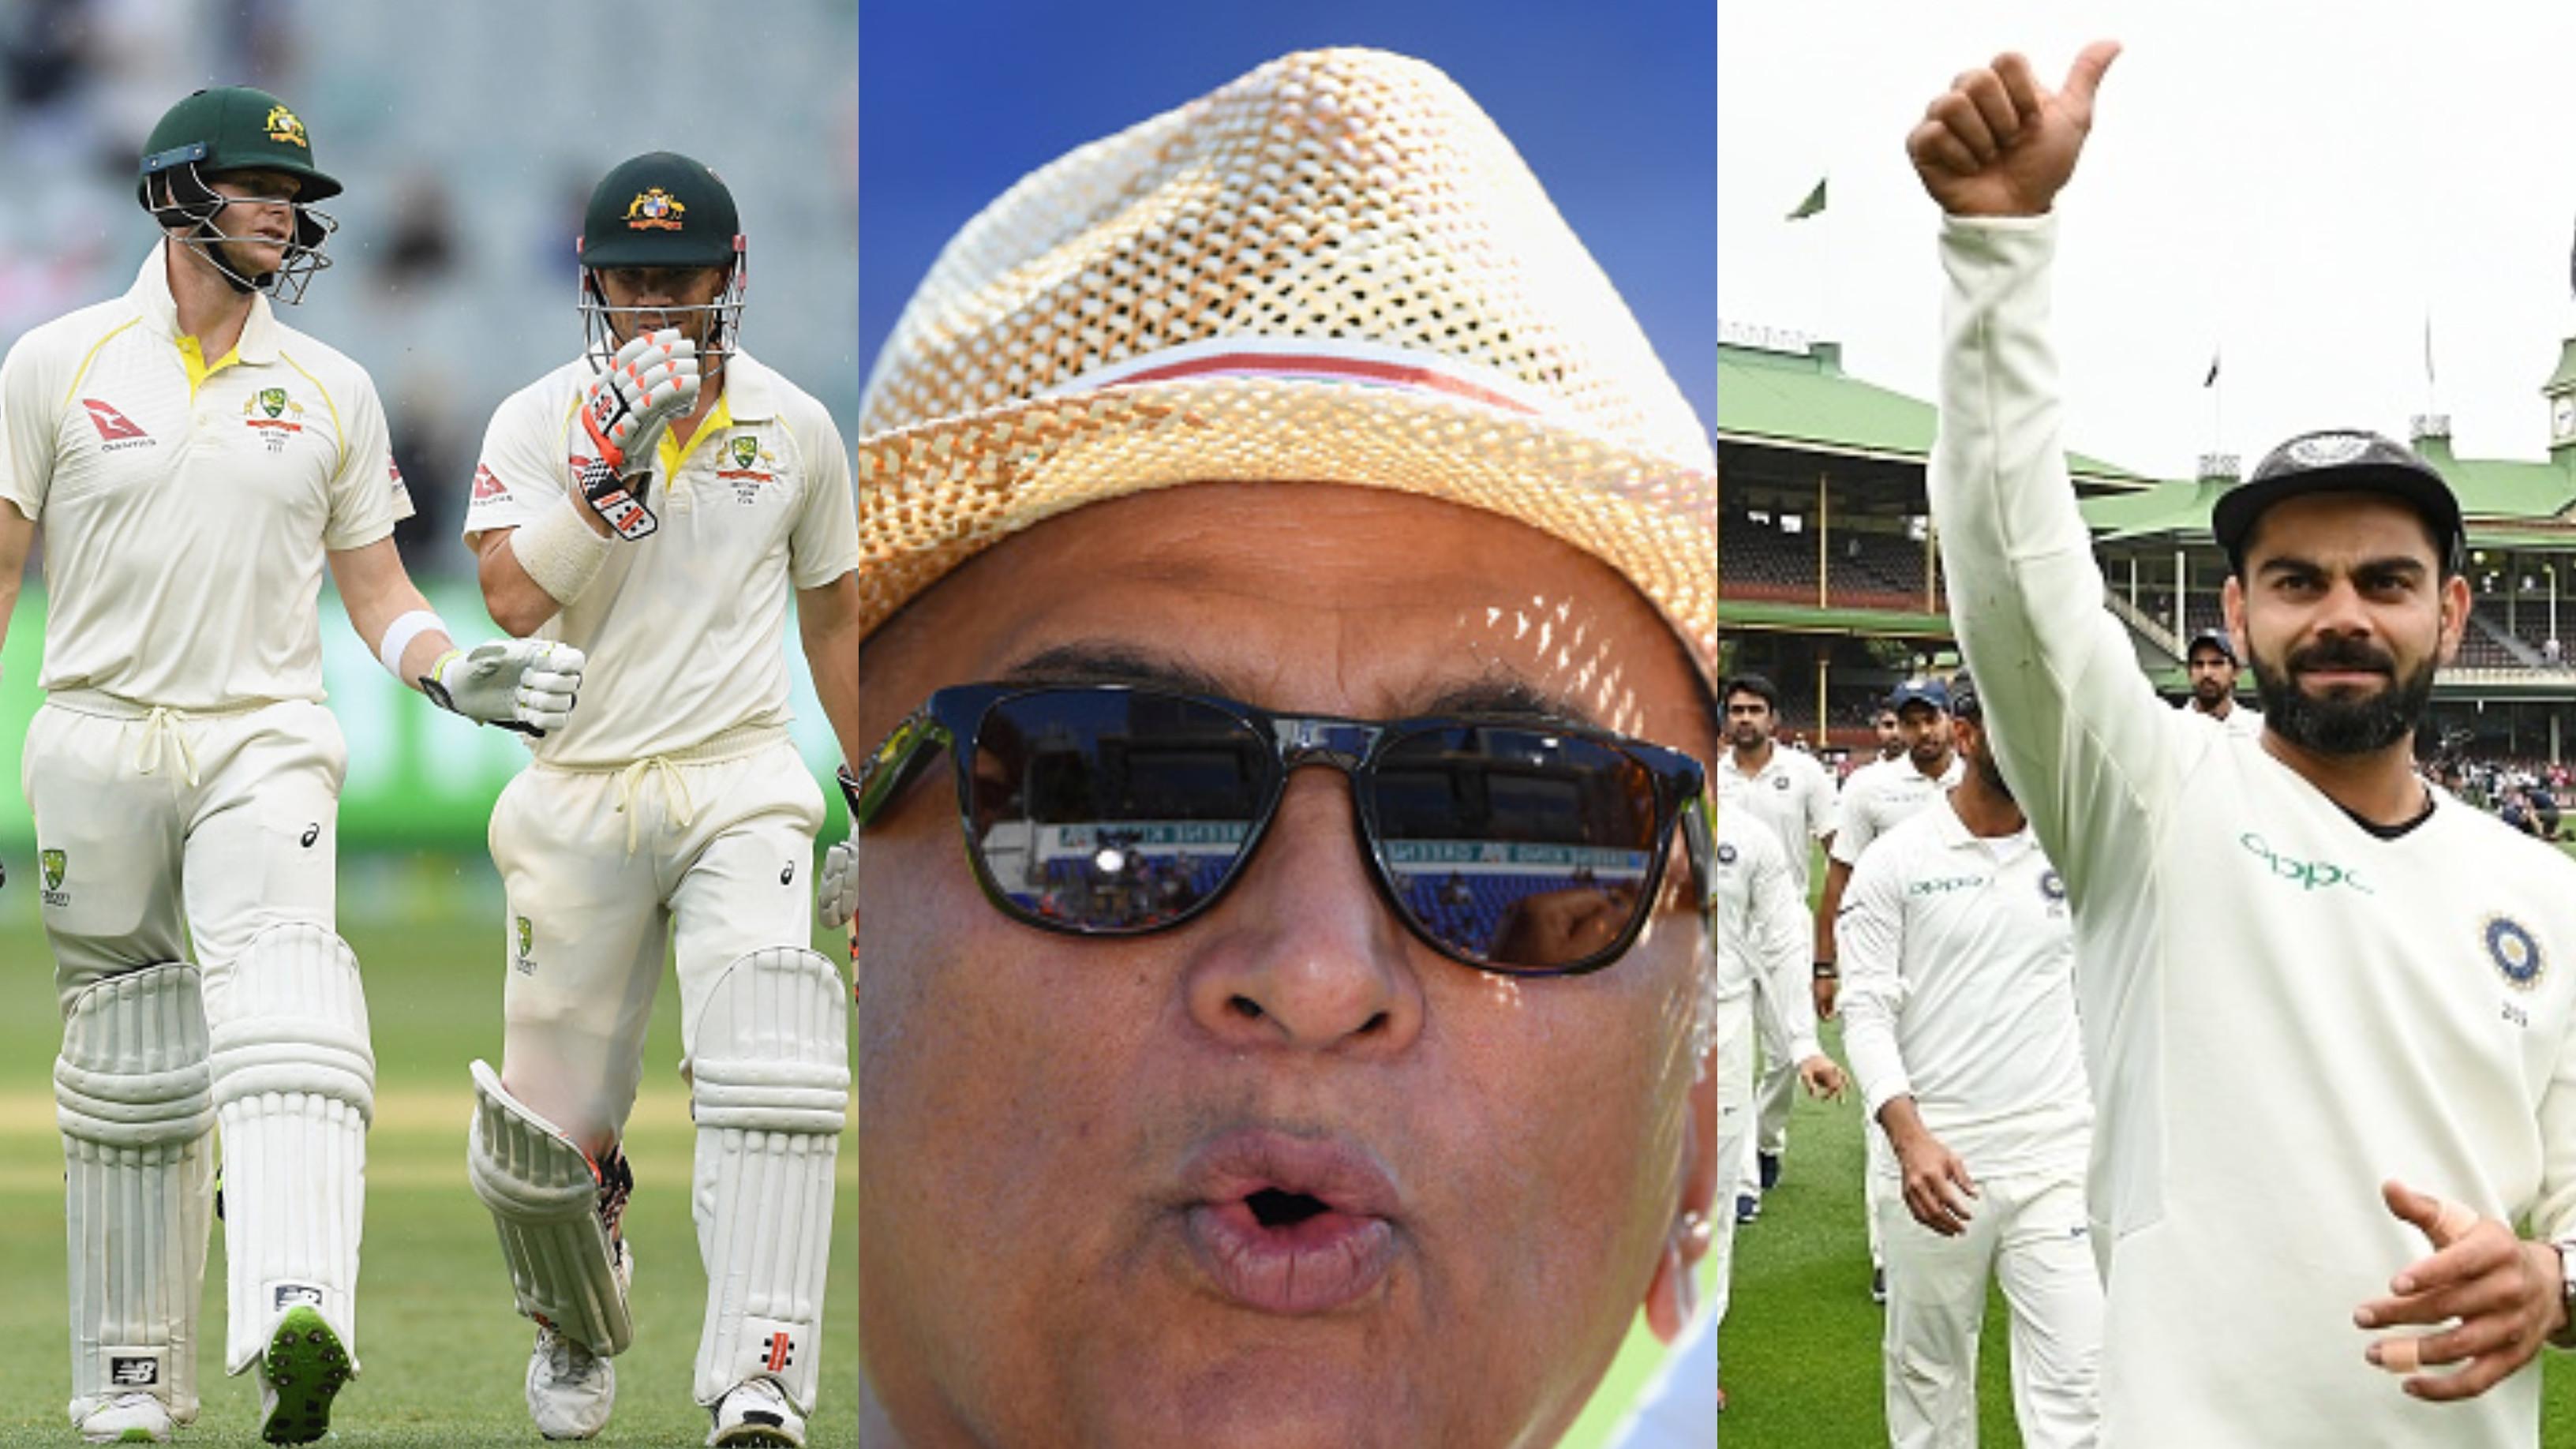 AUS v IND 2018-19: Sunil Gavaskar slams criticism that India's triumph came against a weakened Australian team